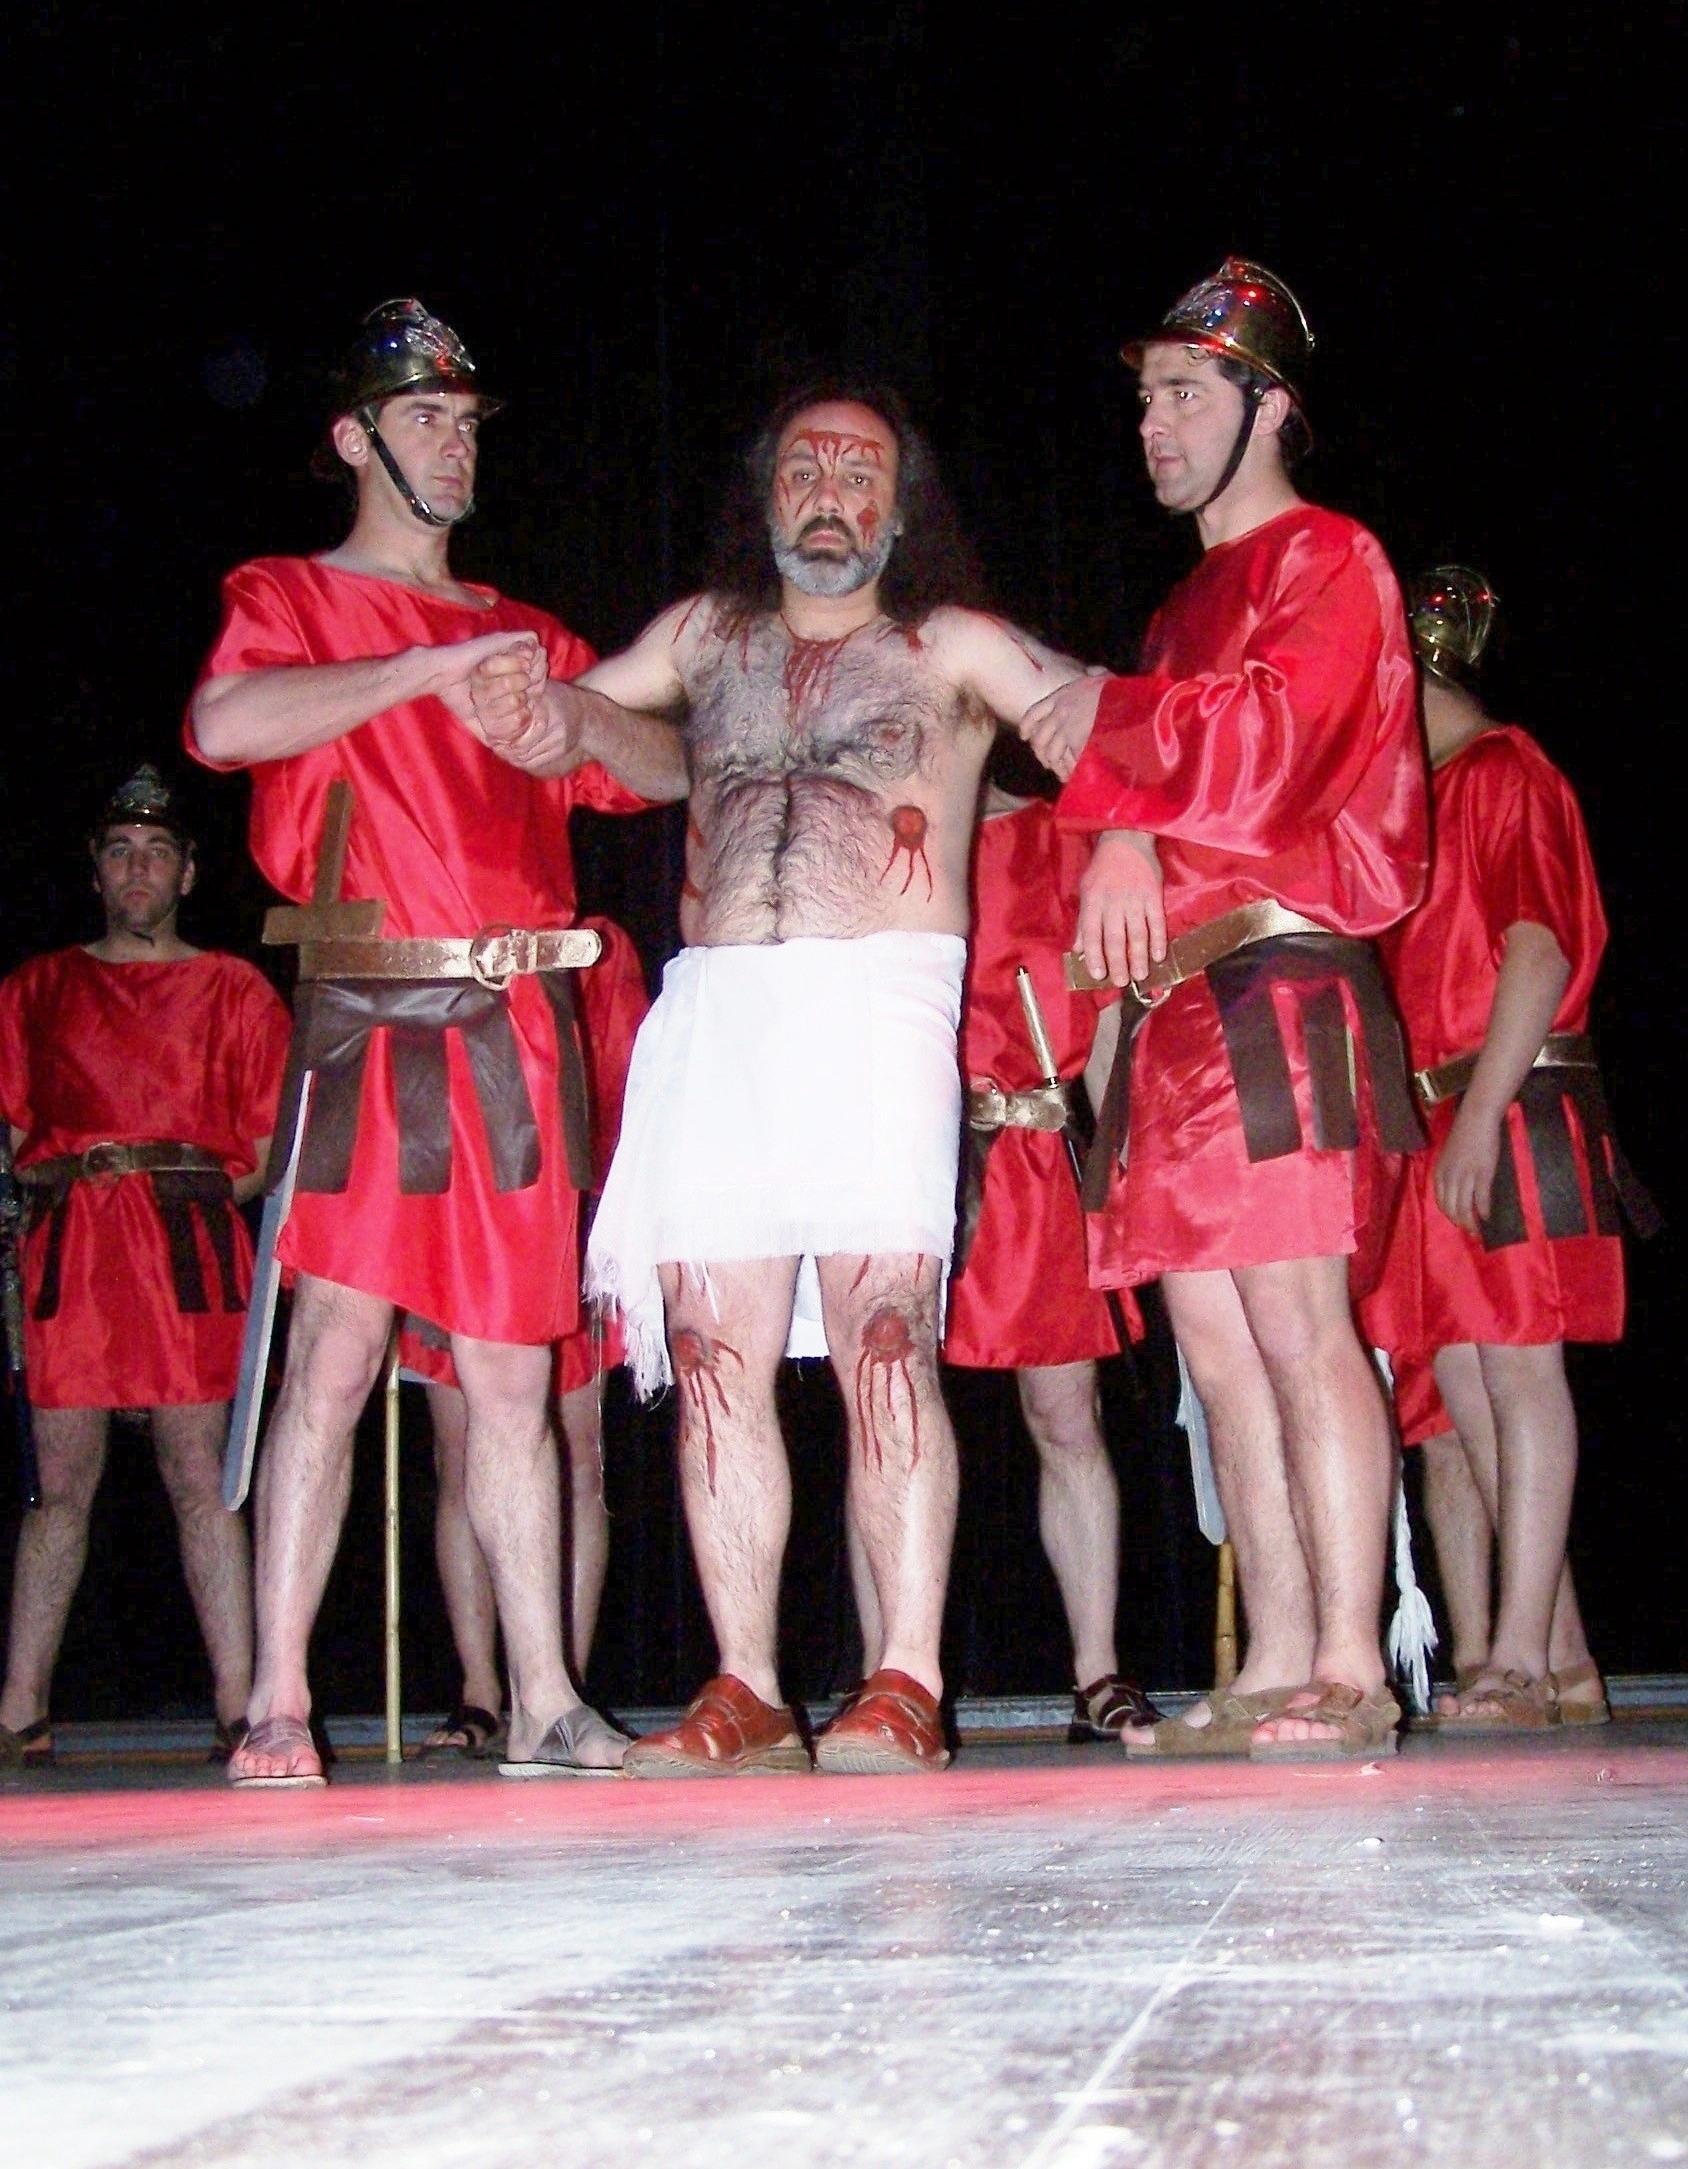 Auto Paixao 2008 Jesus preso pelos soldados Norberto Sousa Manuel Barbosa e Luis Sa FASS